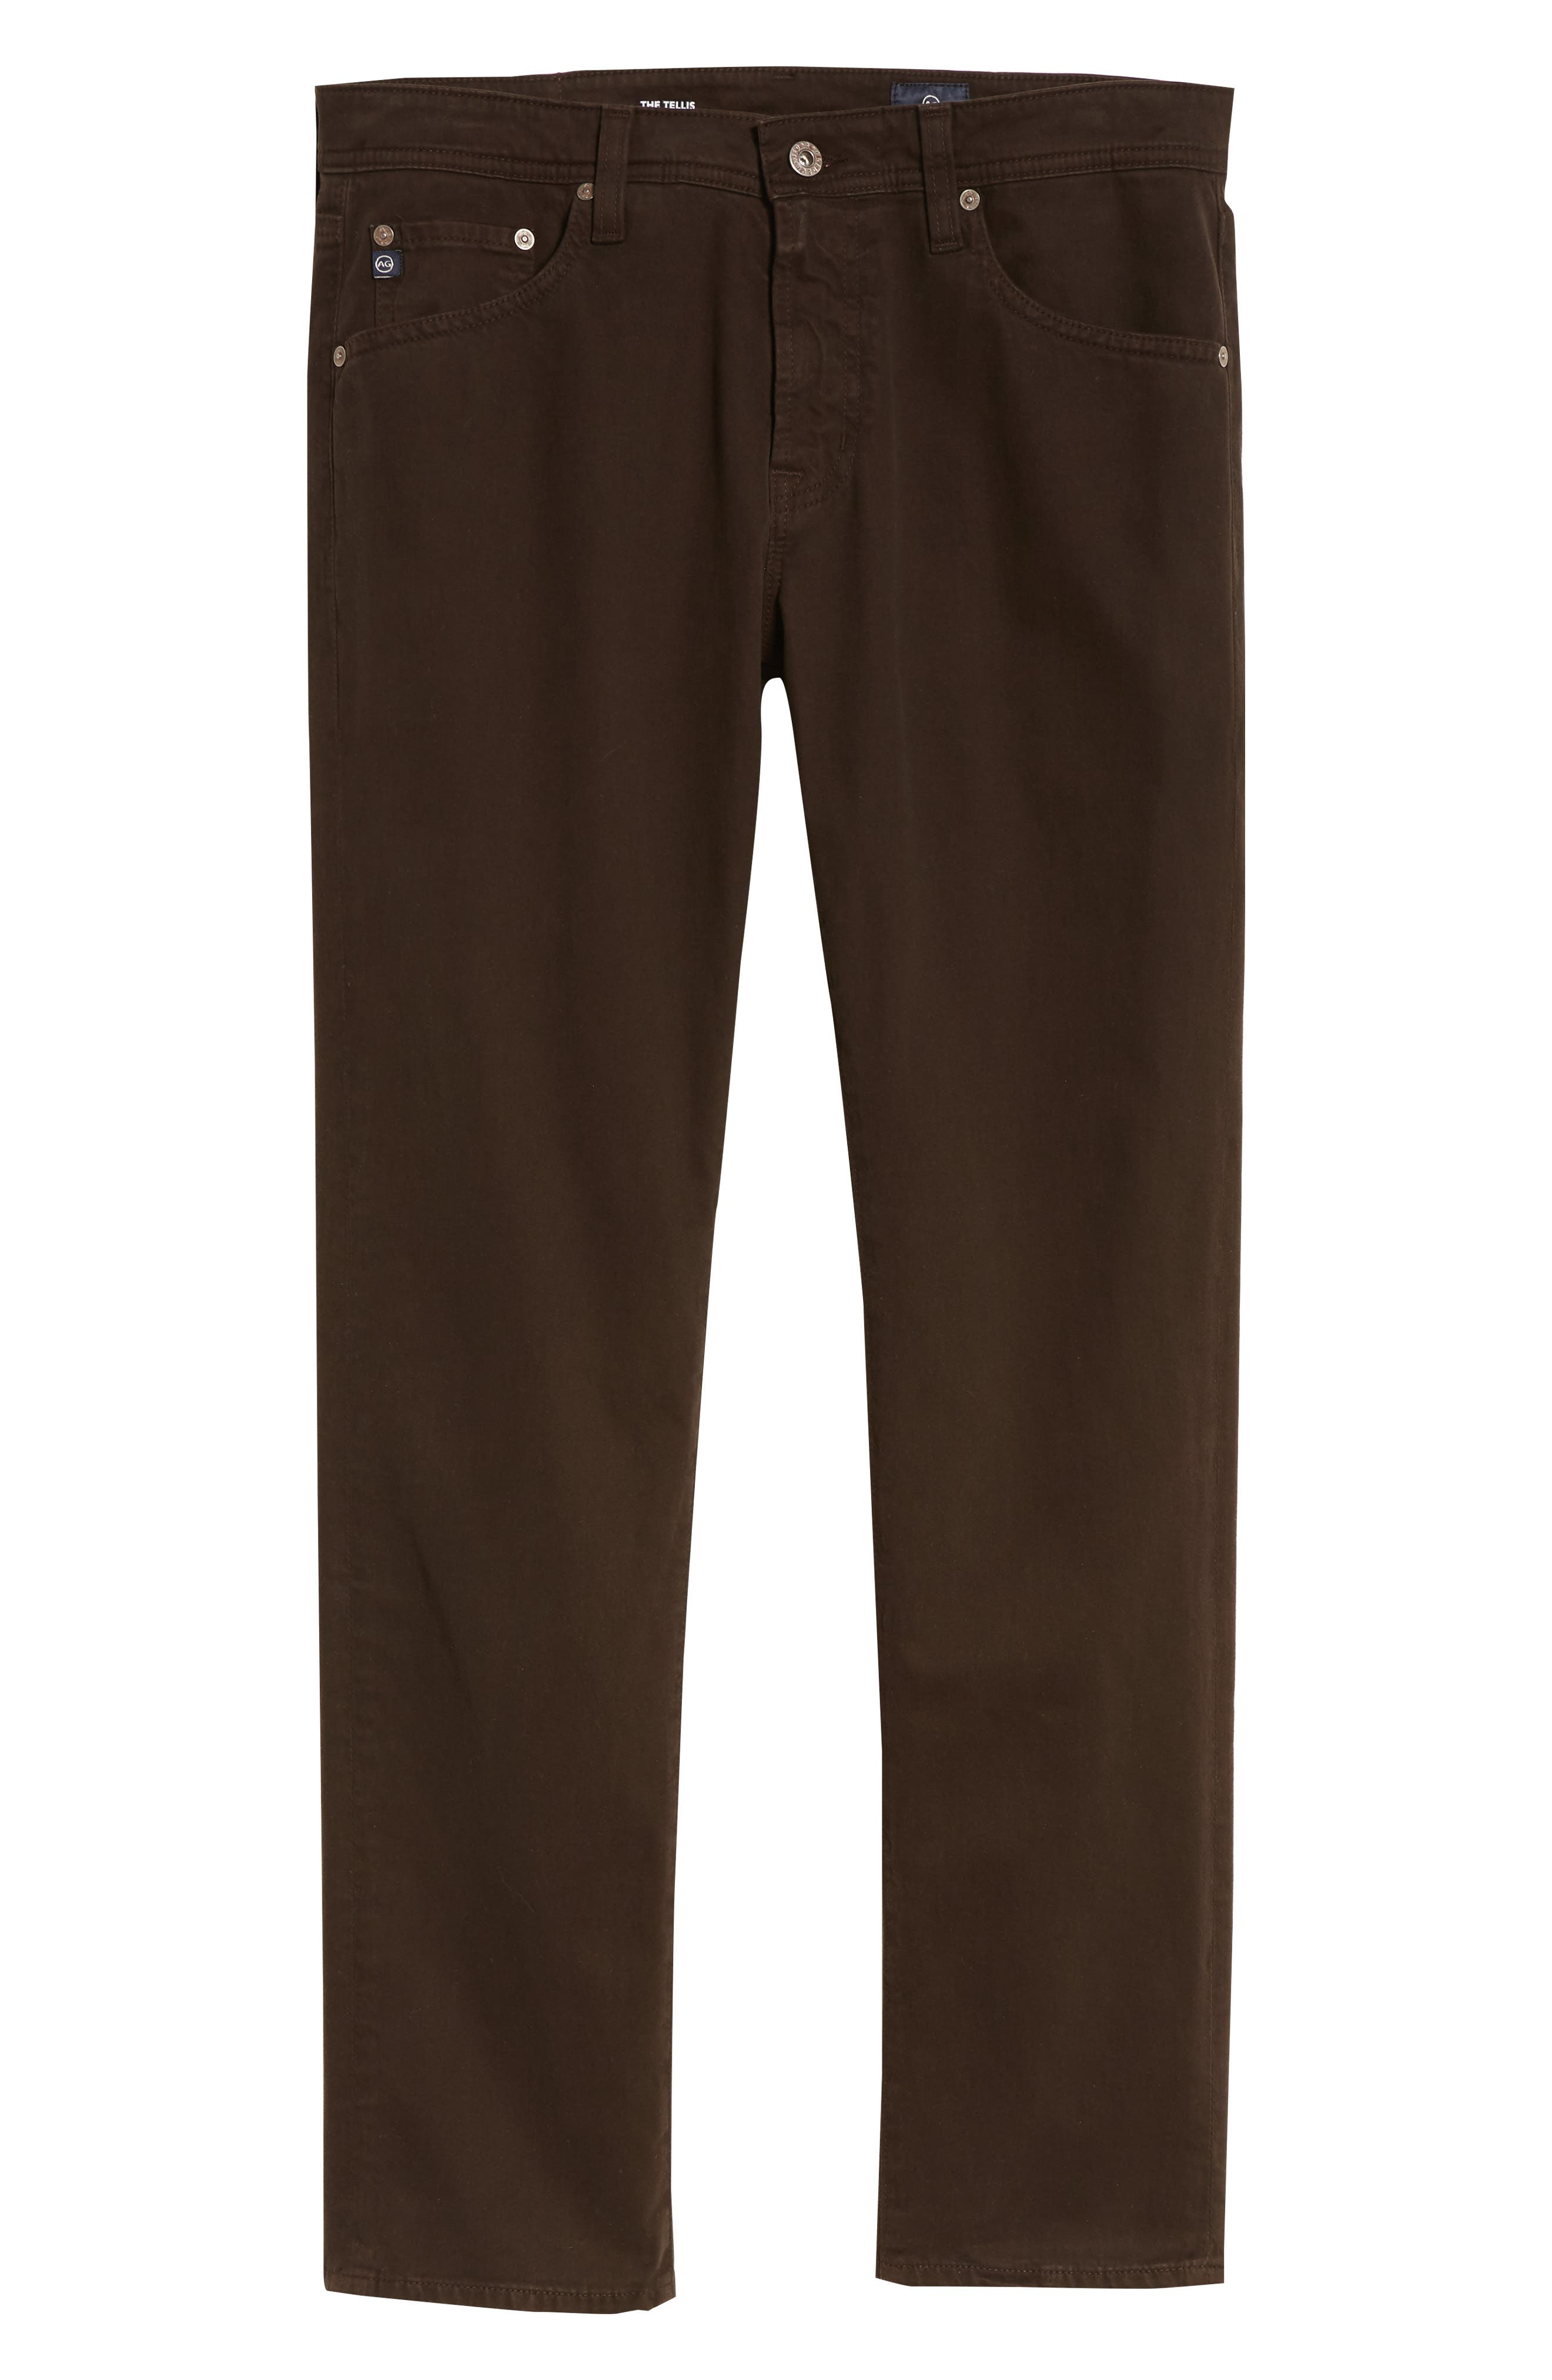 Tellis SUD Modern Slim Stretch Twill Pants,                             Alternate thumbnail 6, color,                             Shutter Brown